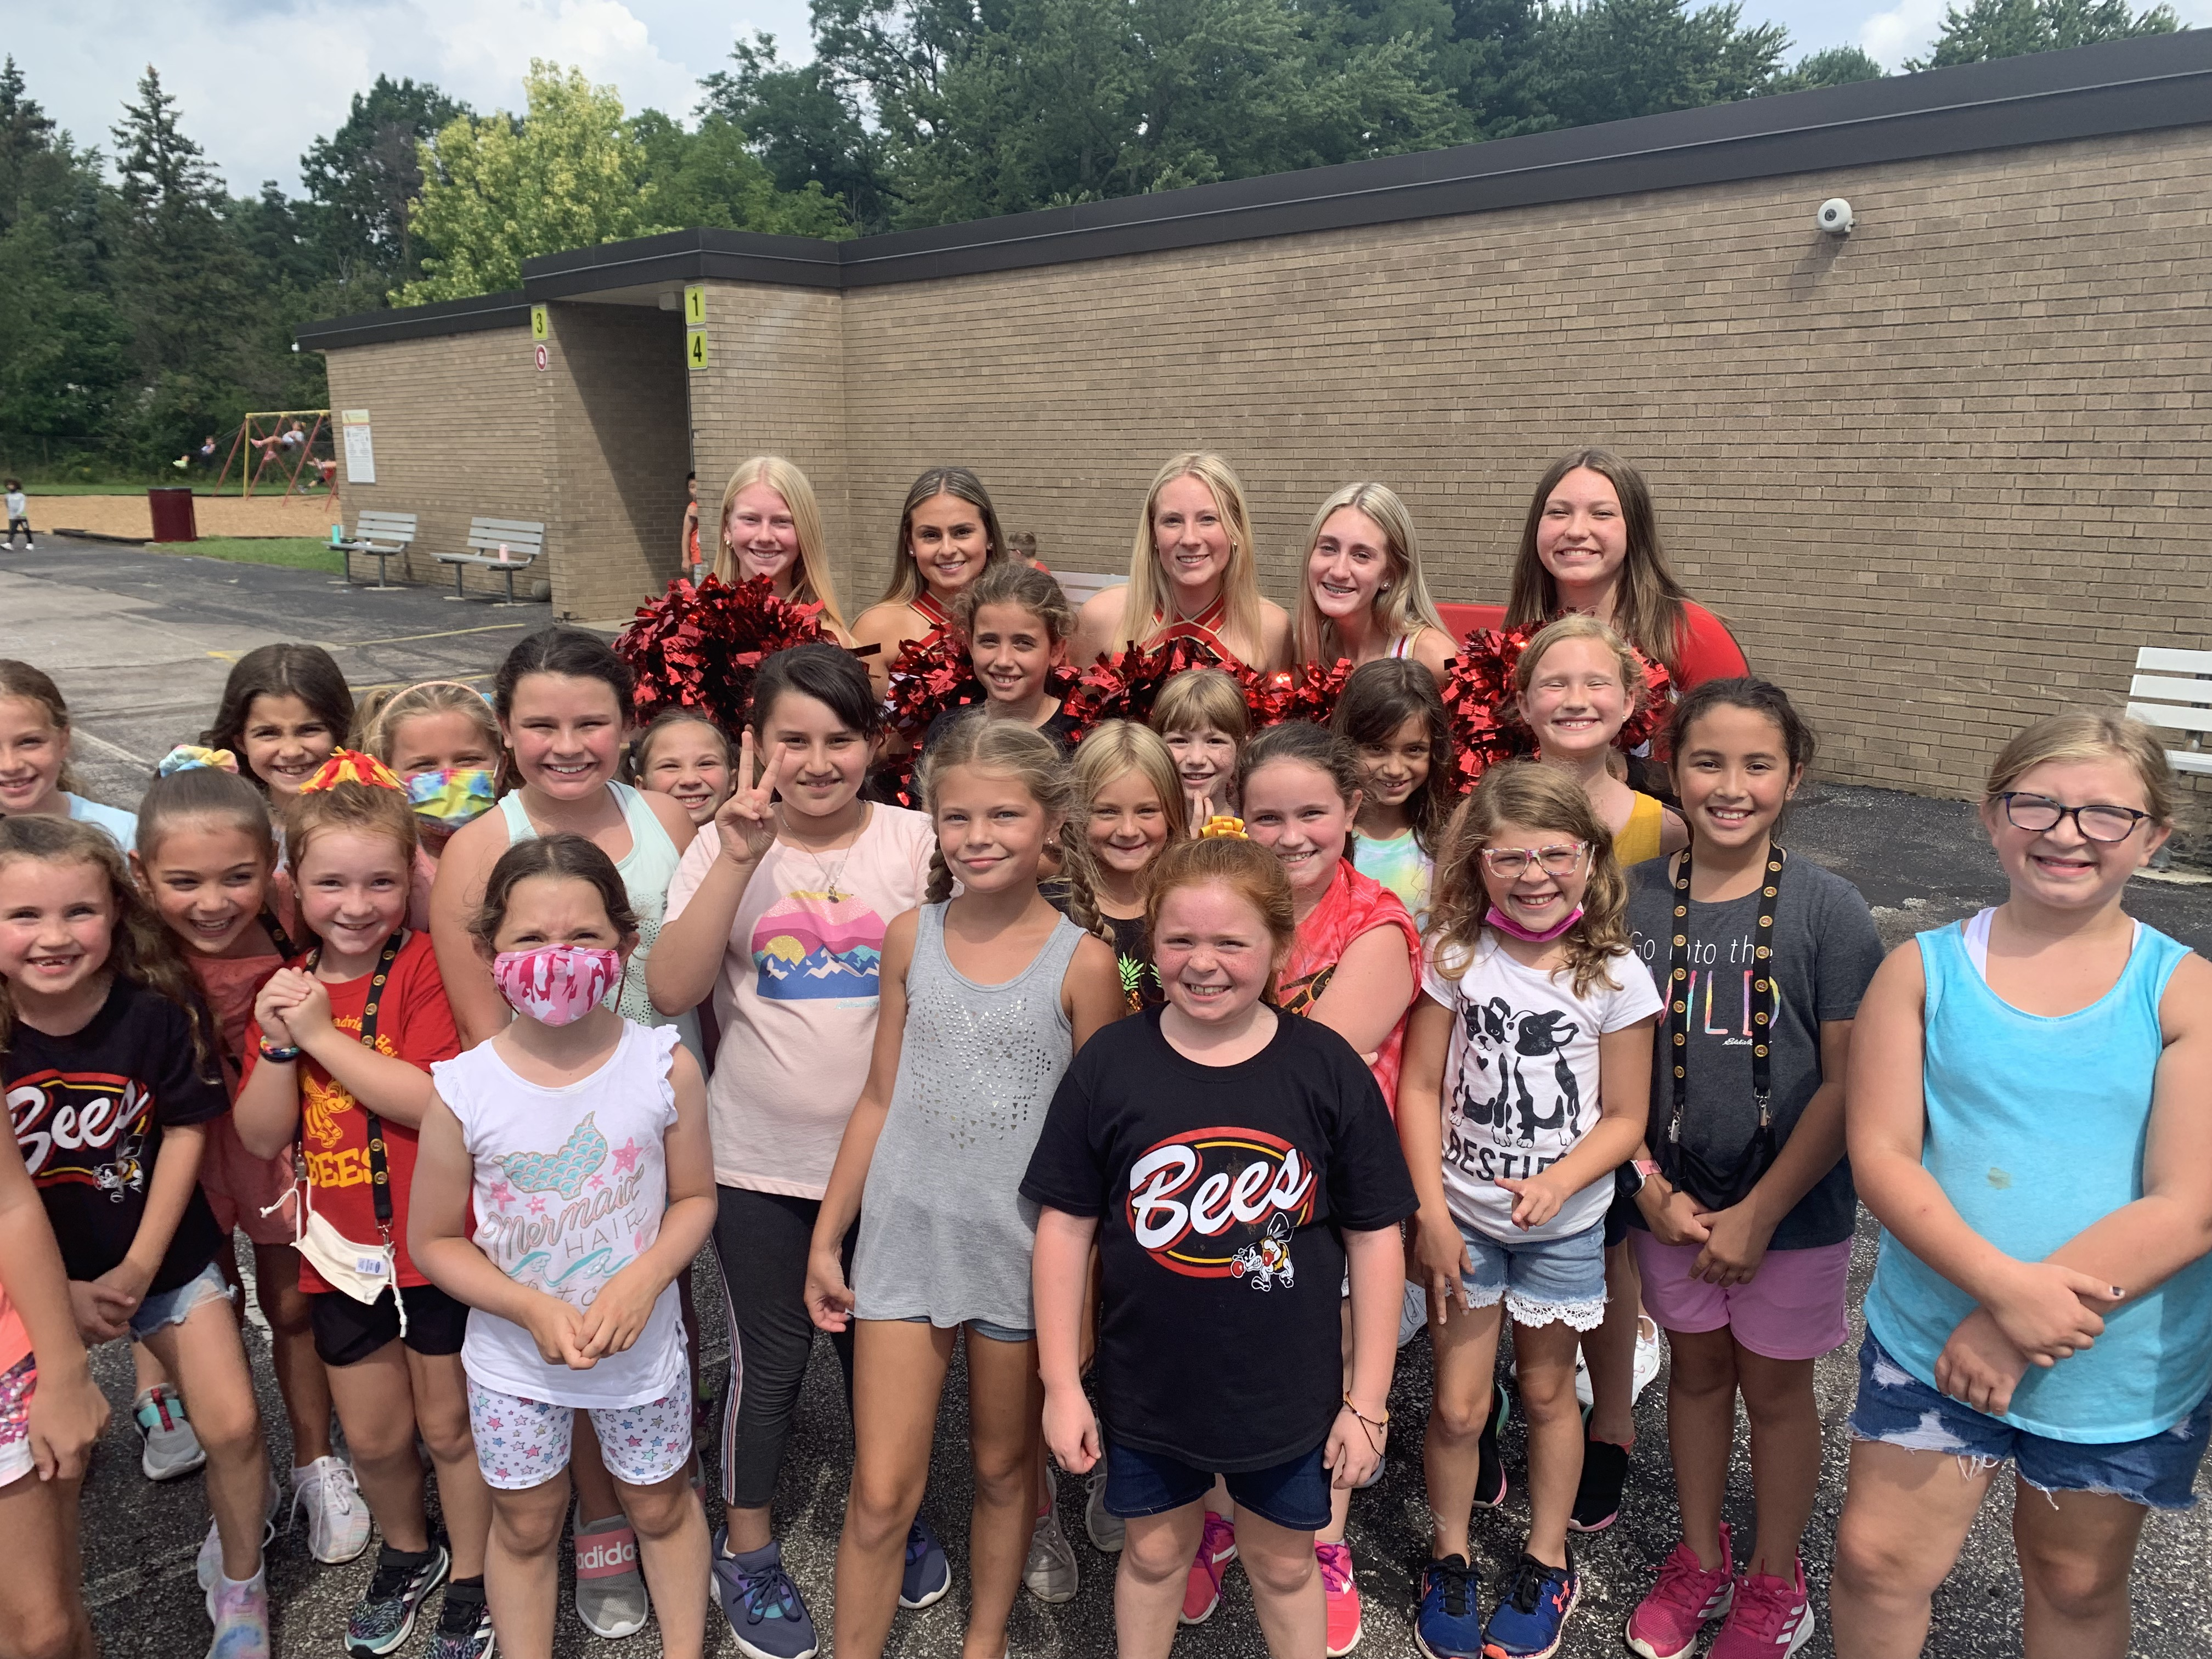 Hilton students with BBHHS senior cheerleaders